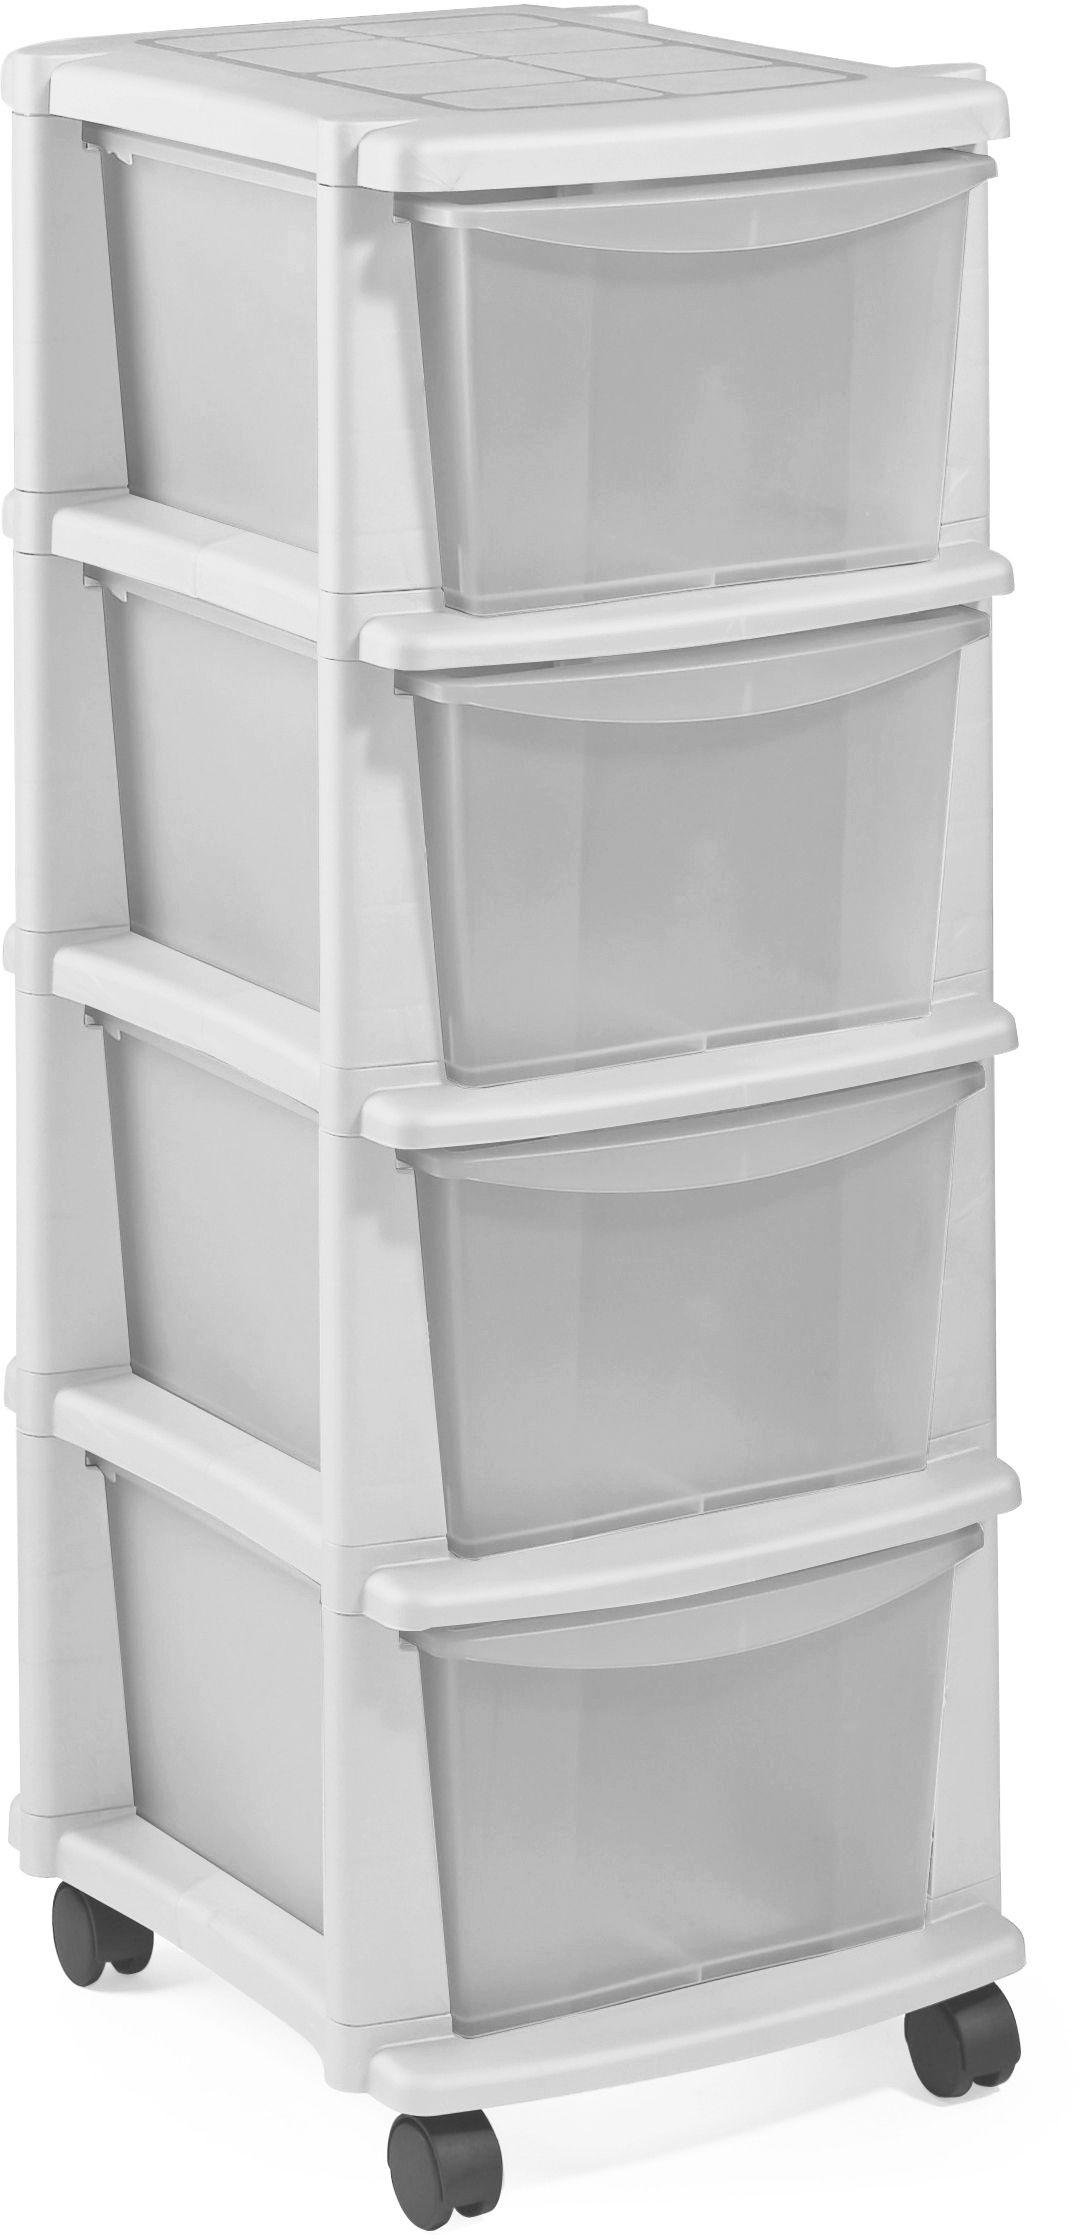 'Home 4 Drawer White Plastic Tower Storage Unit